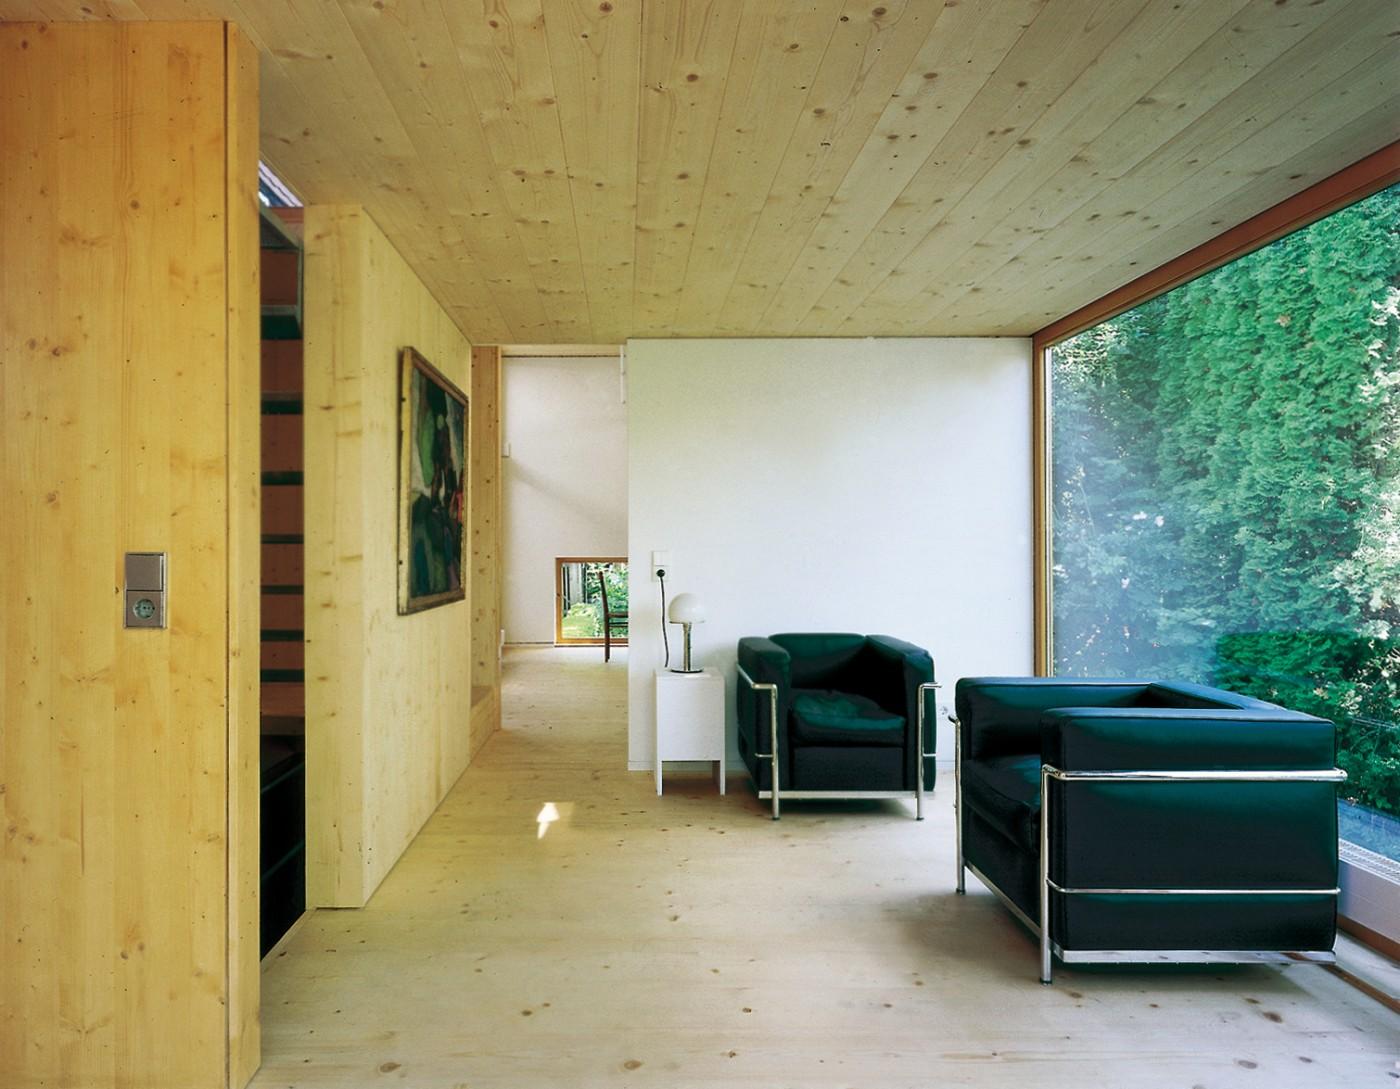 atelier bfa b ro f r architektur. Black Bedroom Furniture Sets. Home Design Ideas